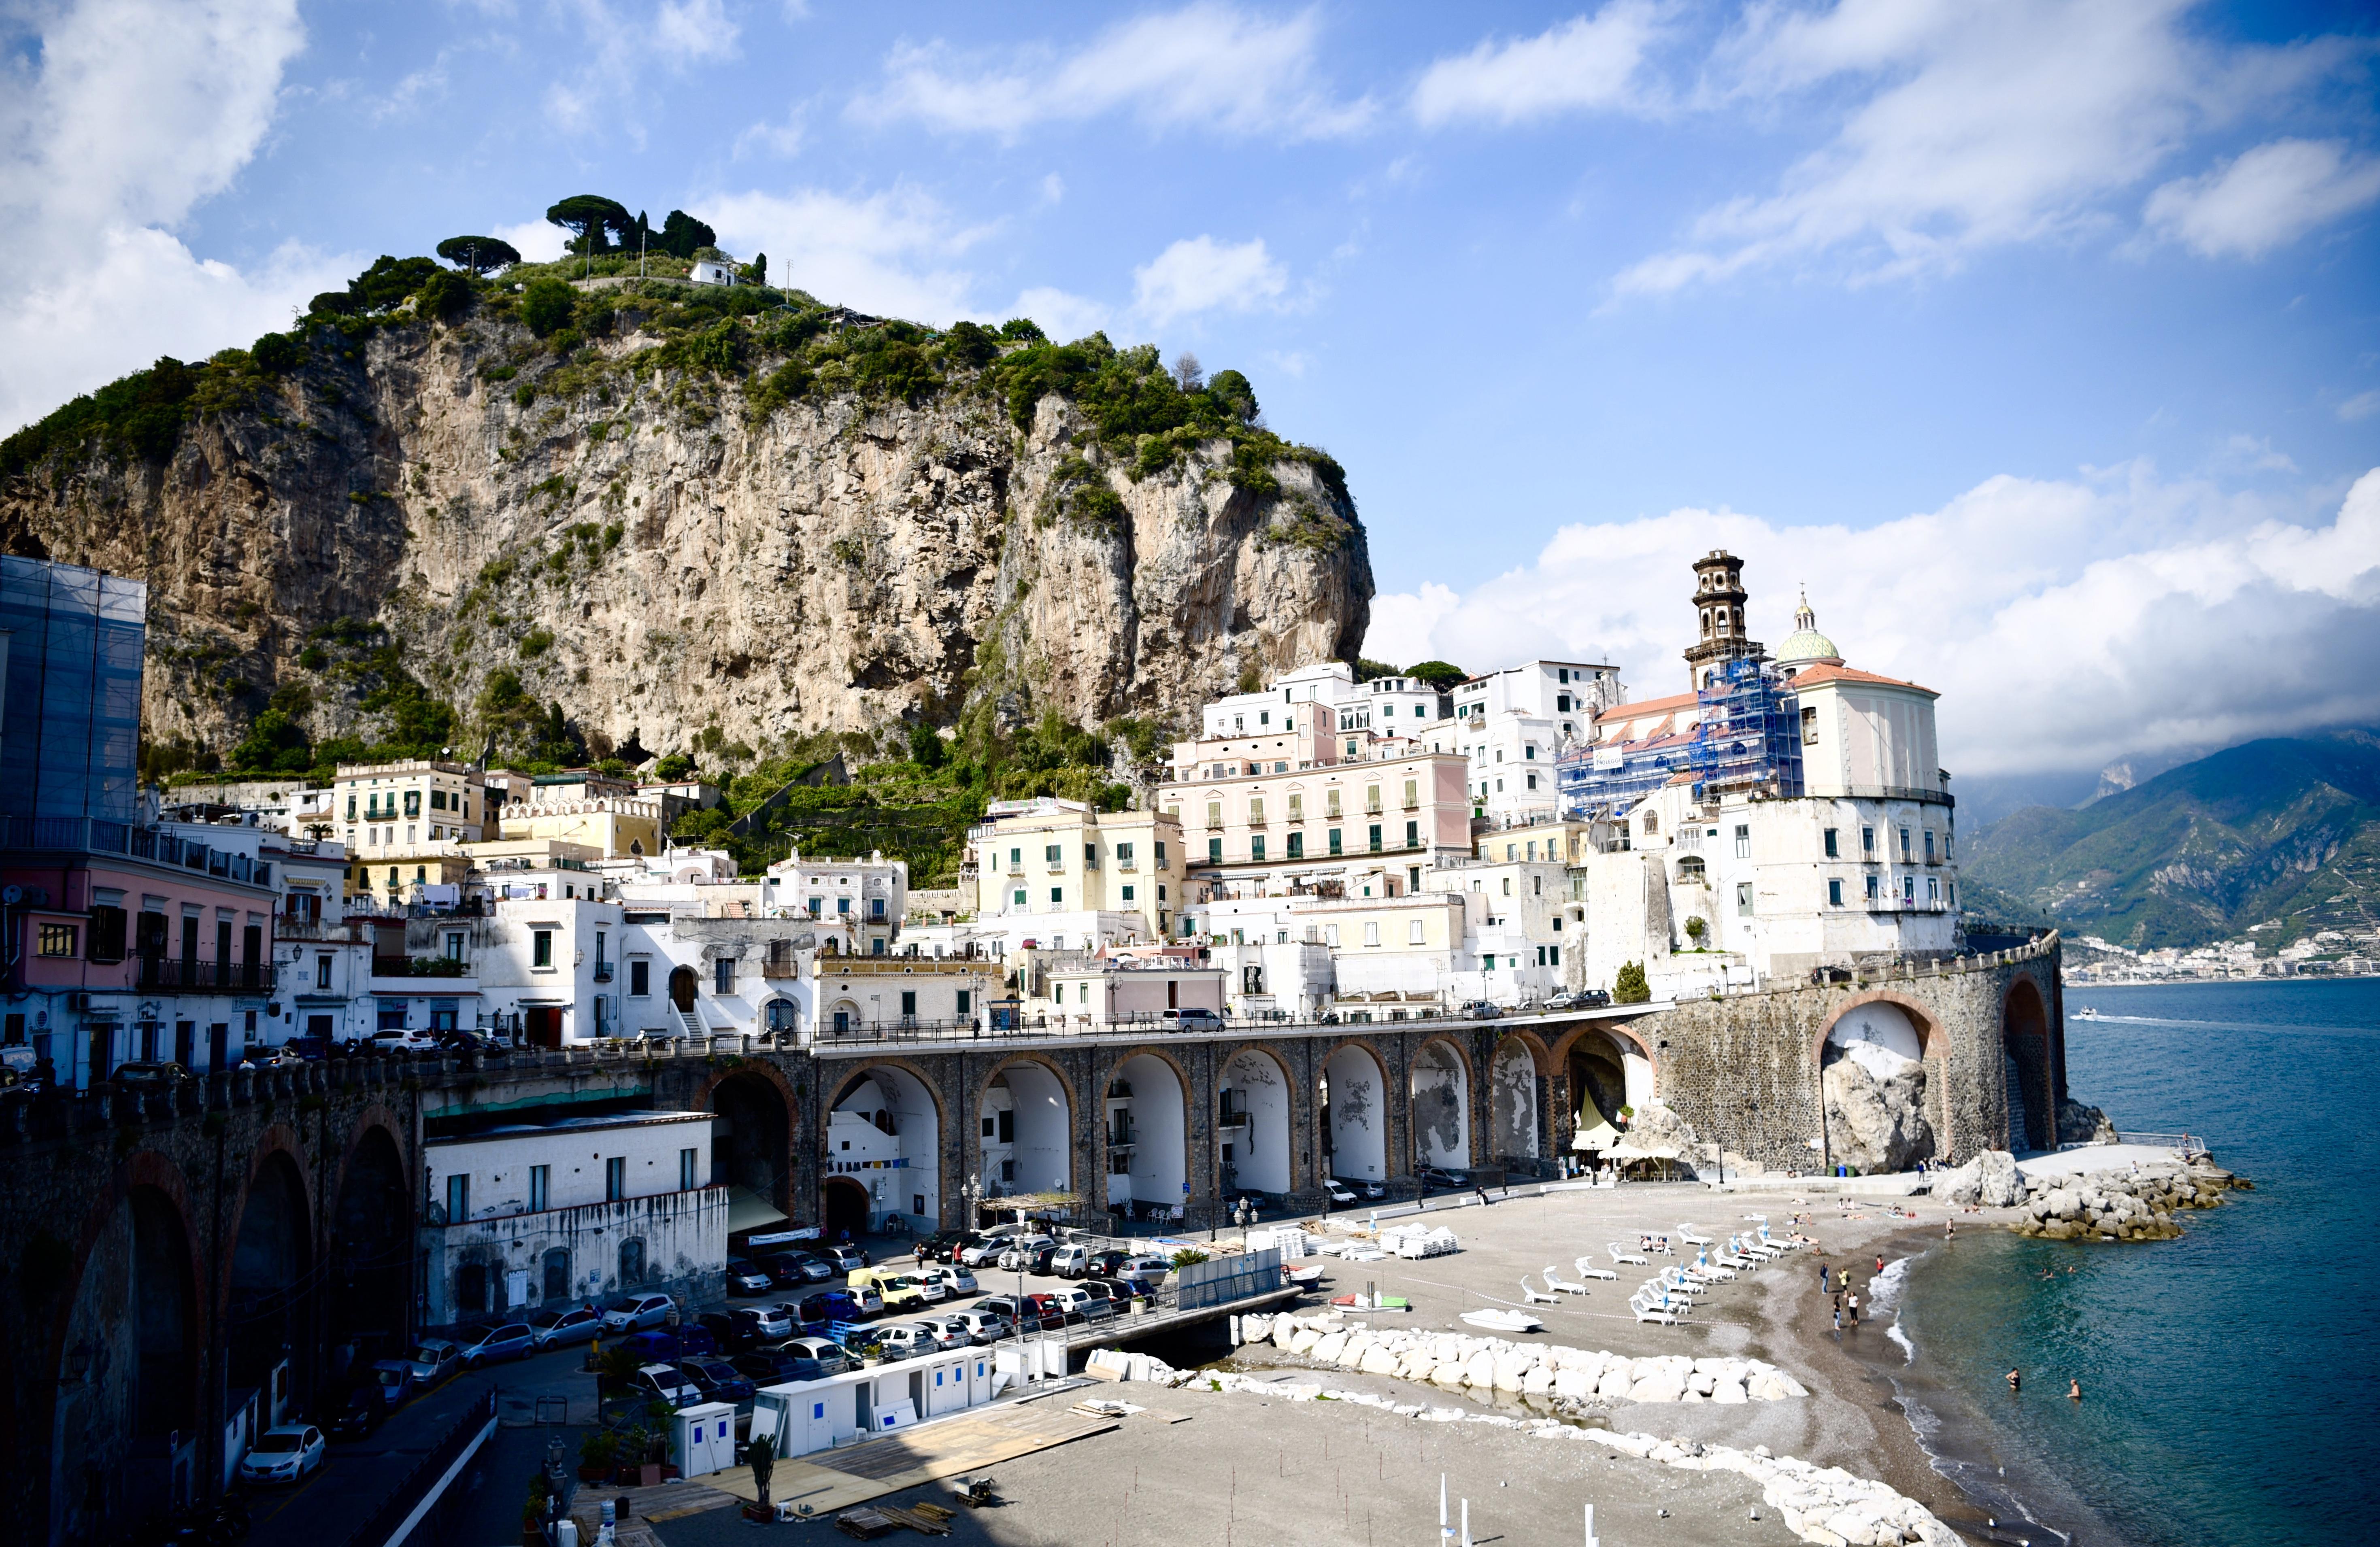 Atrani Town Amalfi Coast Beach DNXB dongnanxibei